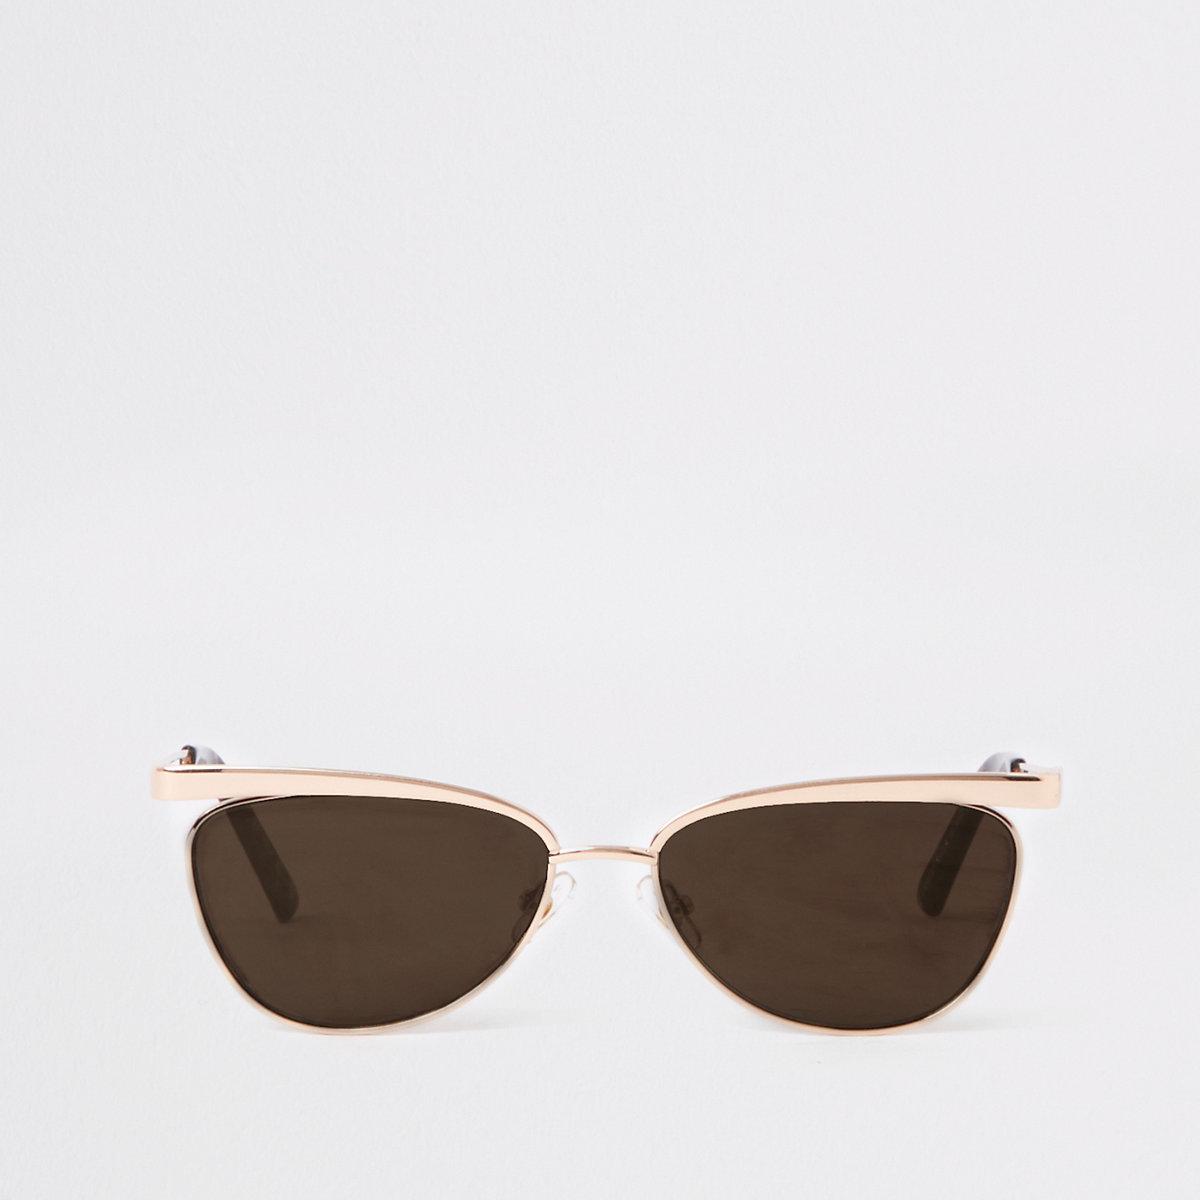 Gold slim revo lens sunglasses